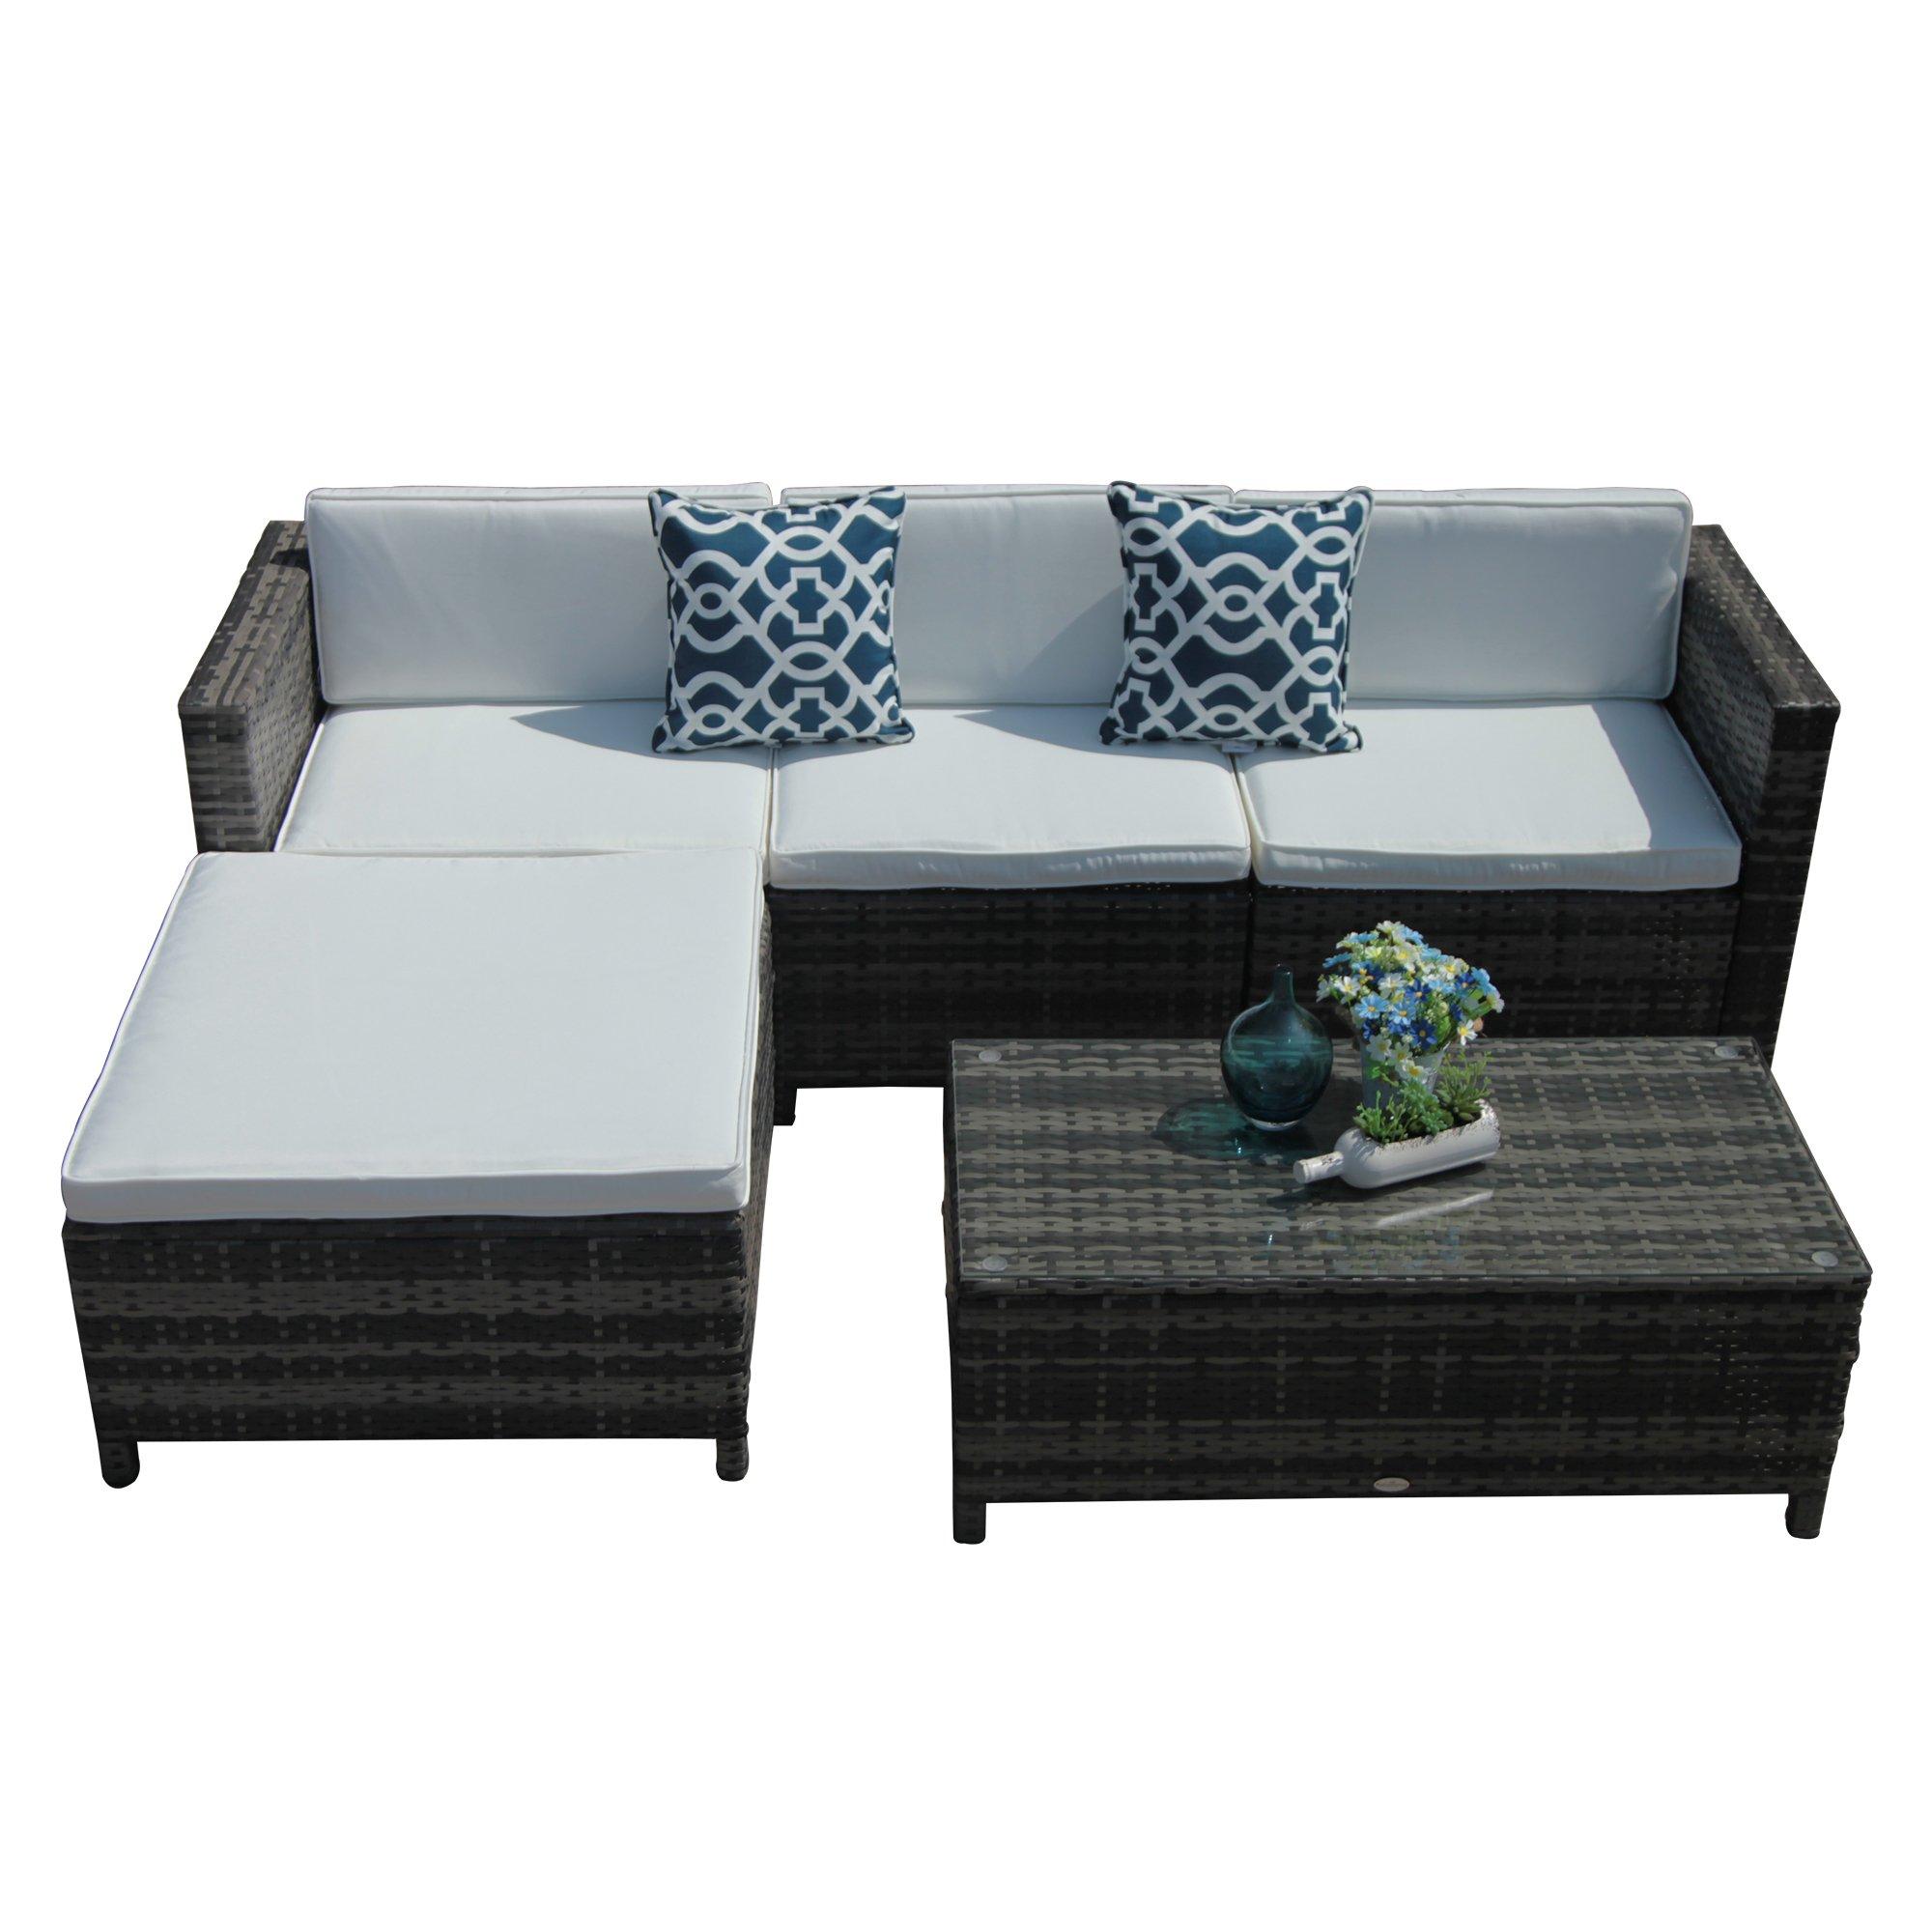 Patiorama 5 Piece Patio Furniture Set, All Weather Grey PE ... on 5 Piece Sectional Patio Set id=79512